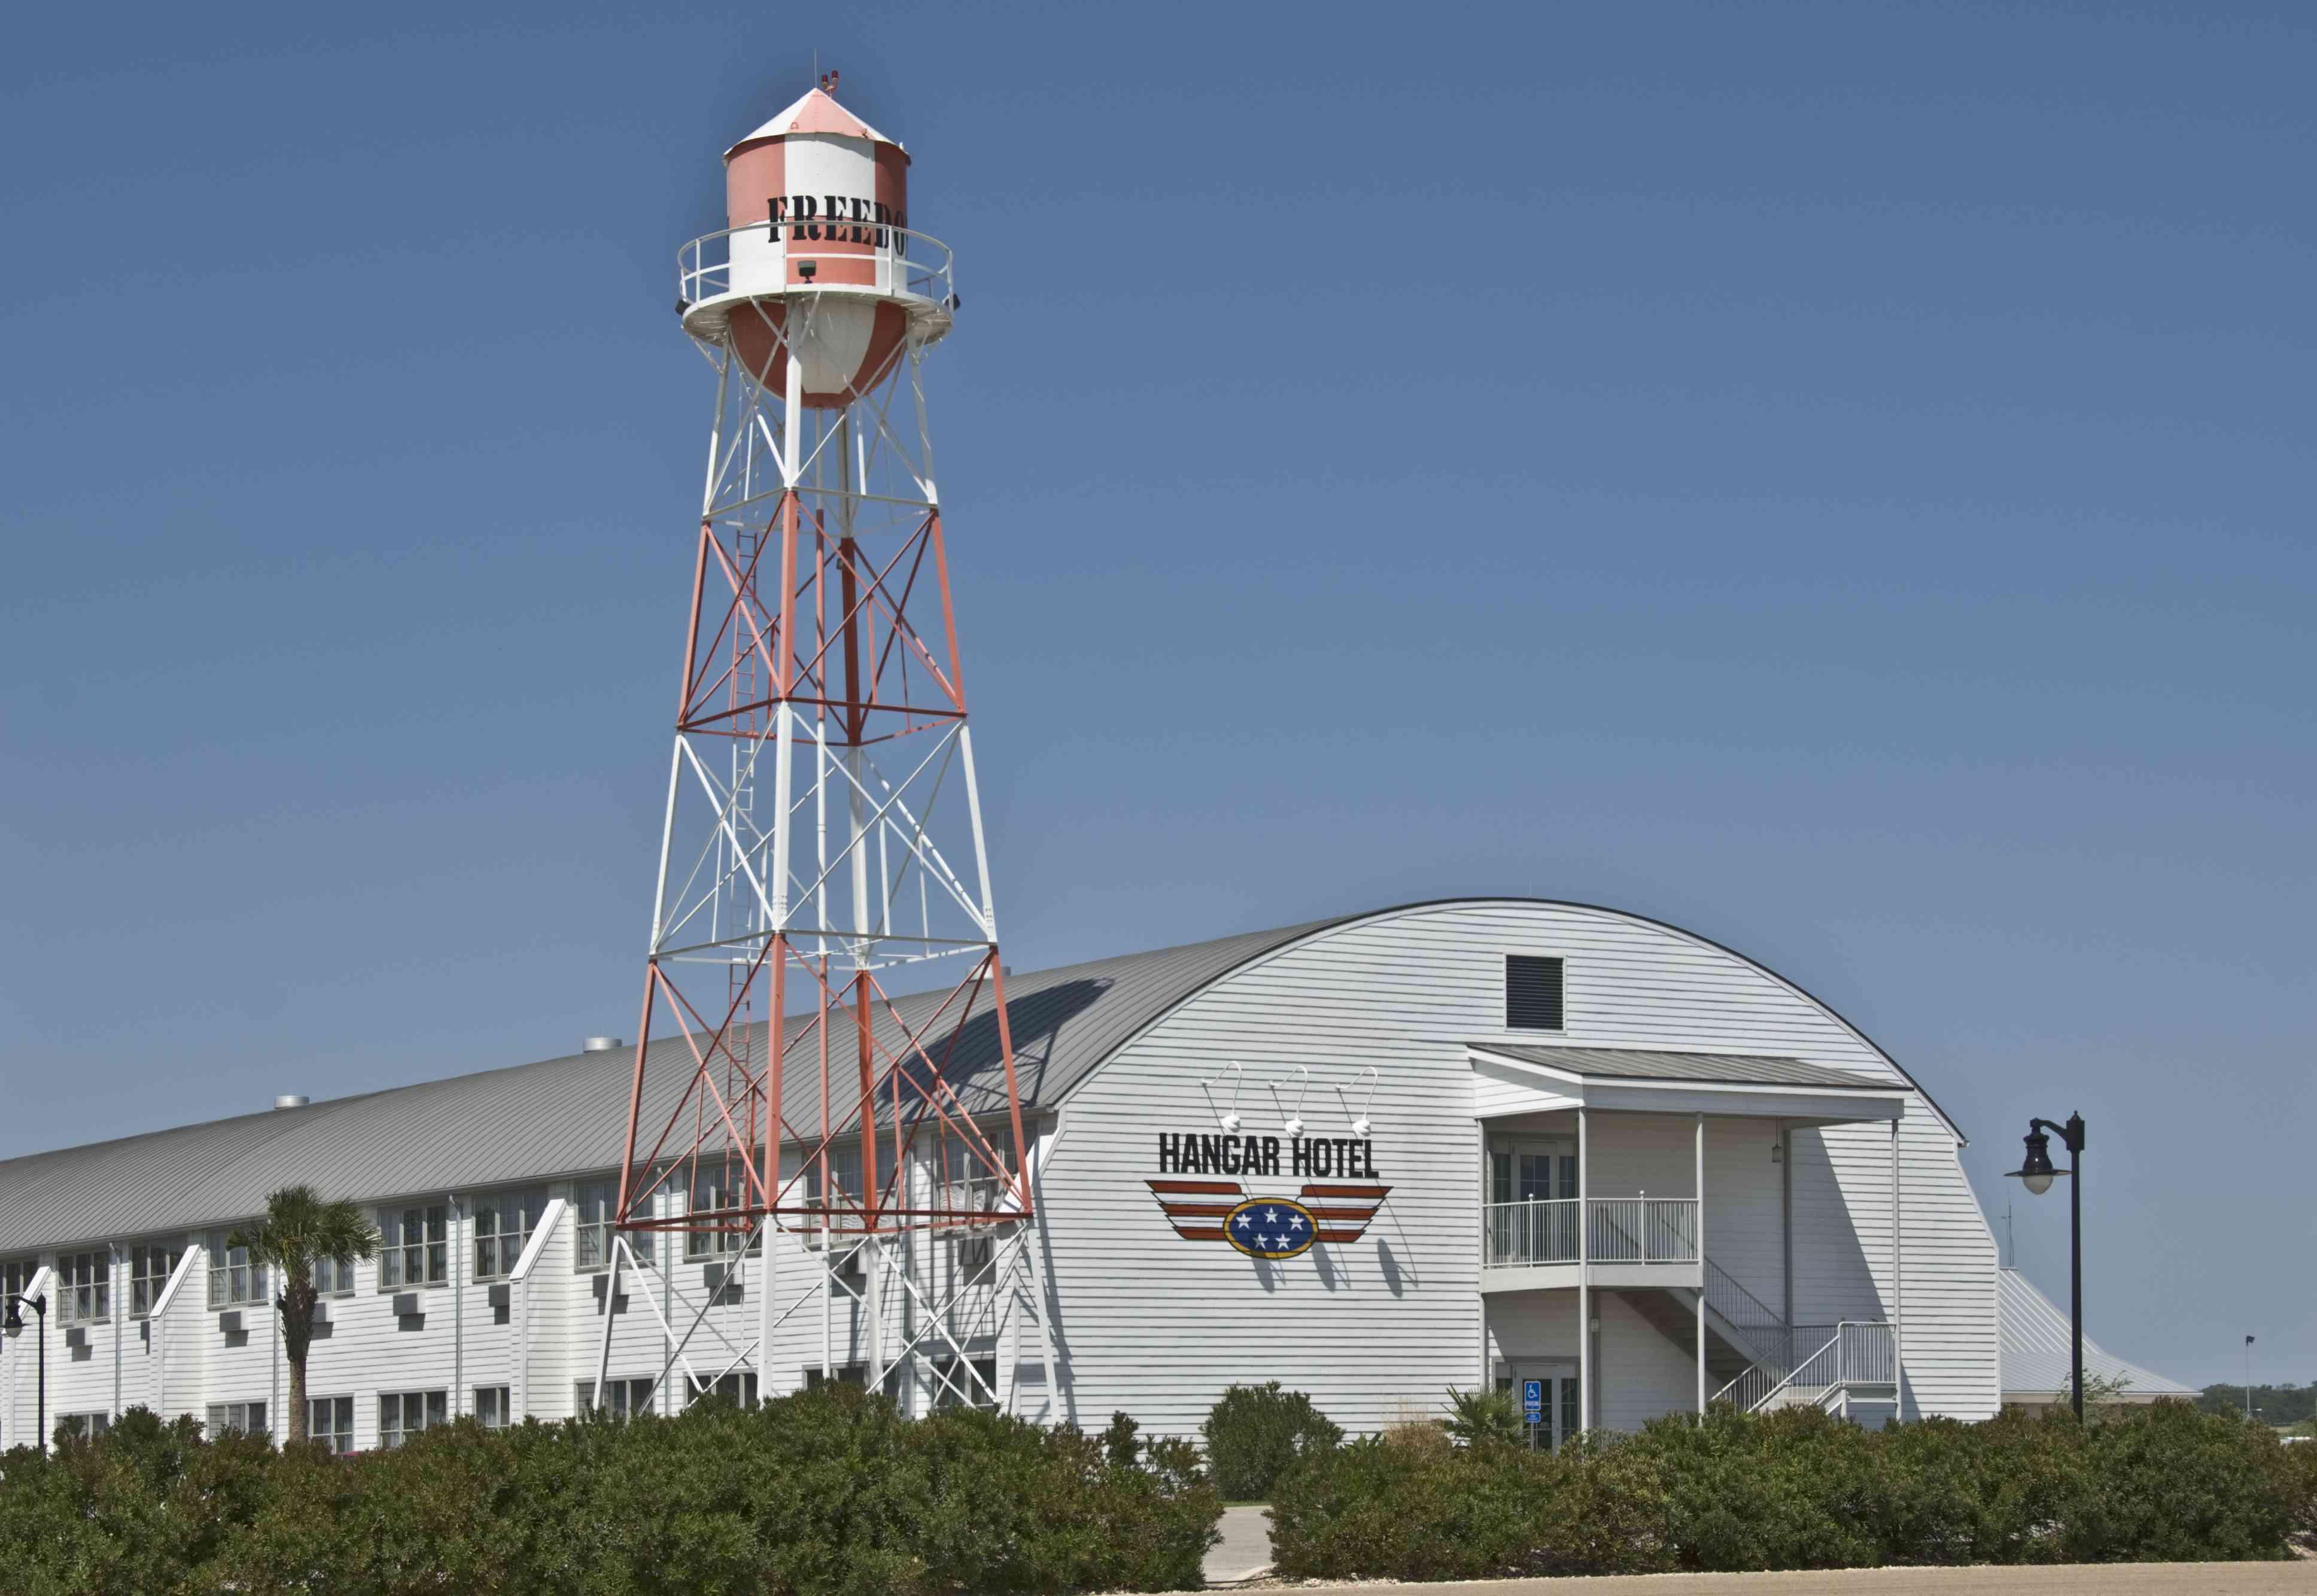 Hangar Hotel in Fredericksburg, Texas